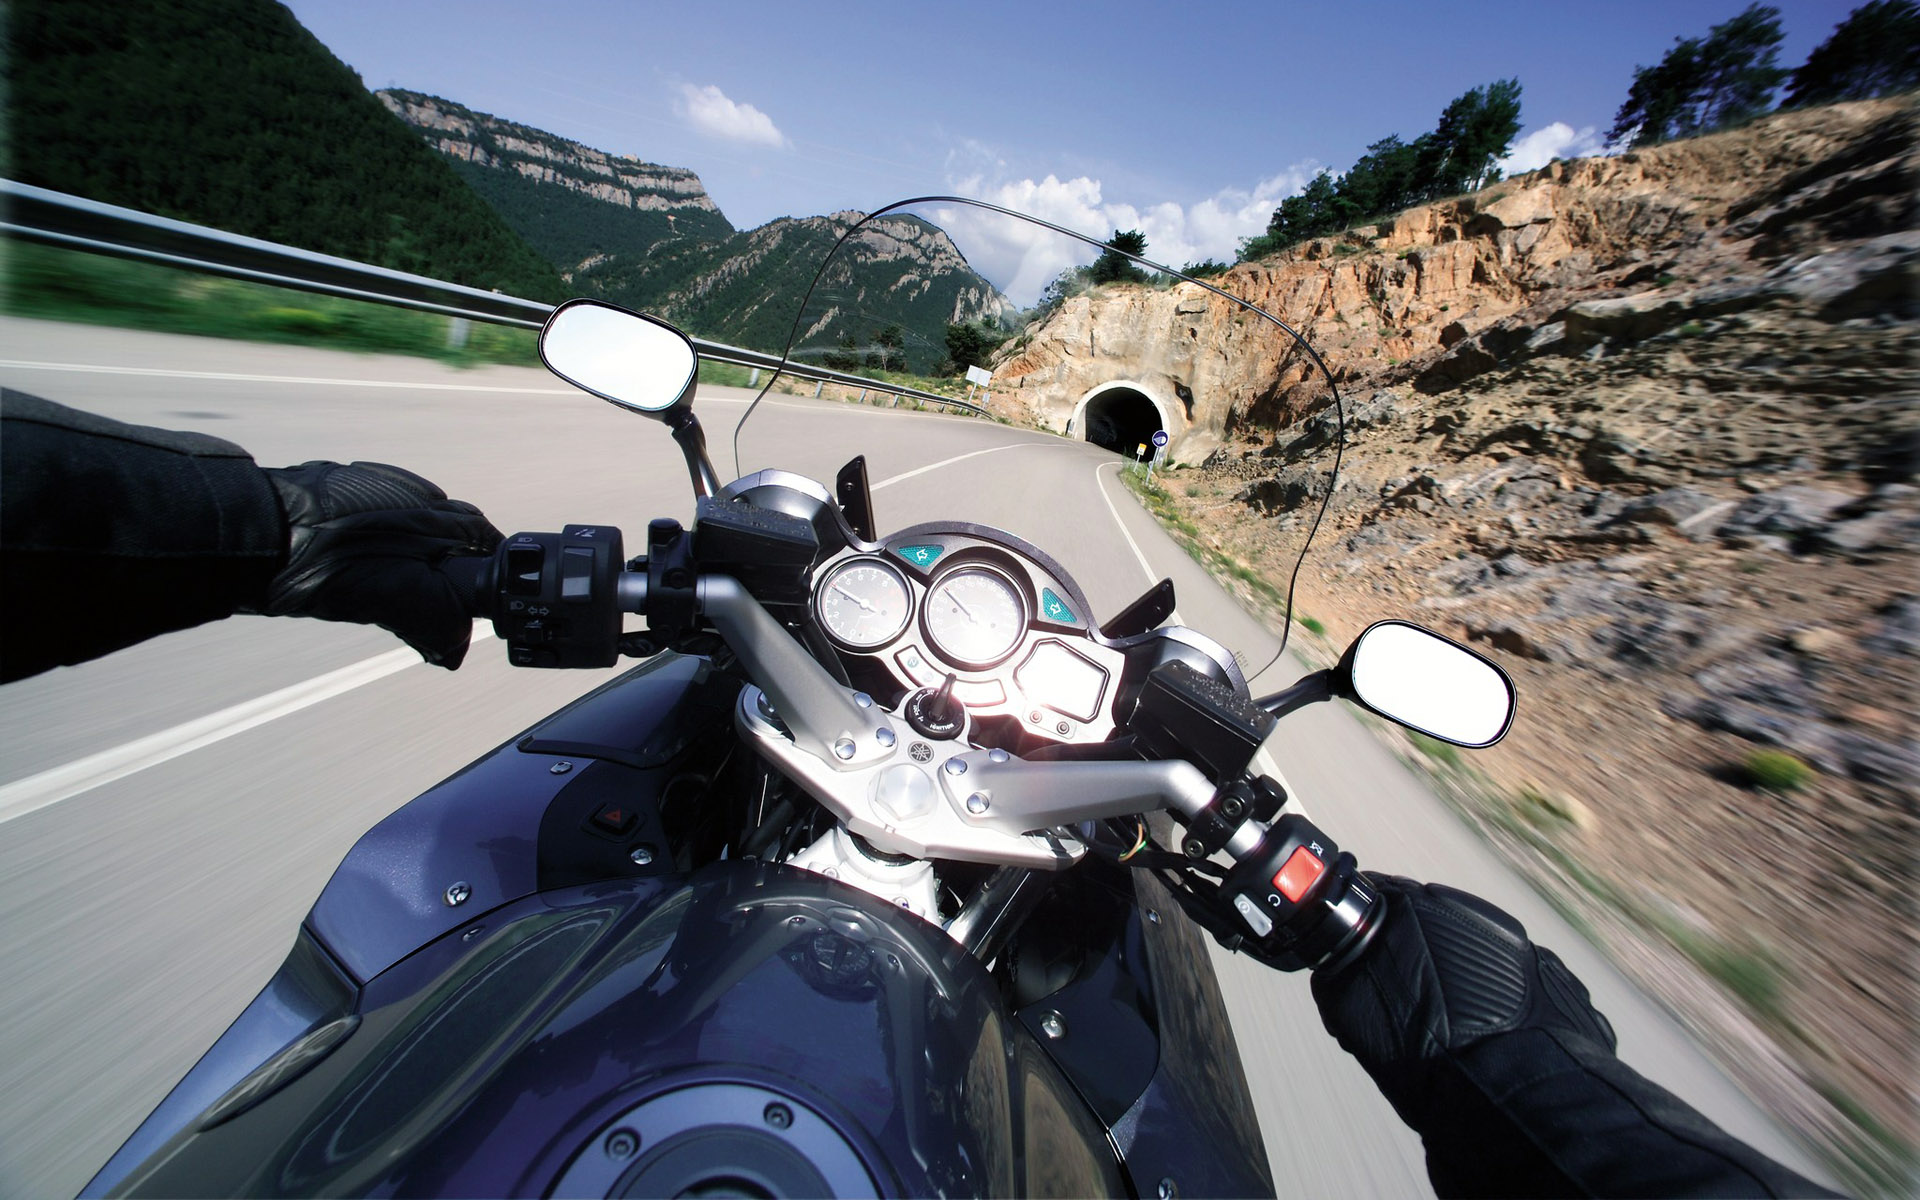 мотоцикл от первого лица дорога  № 16390 без смс